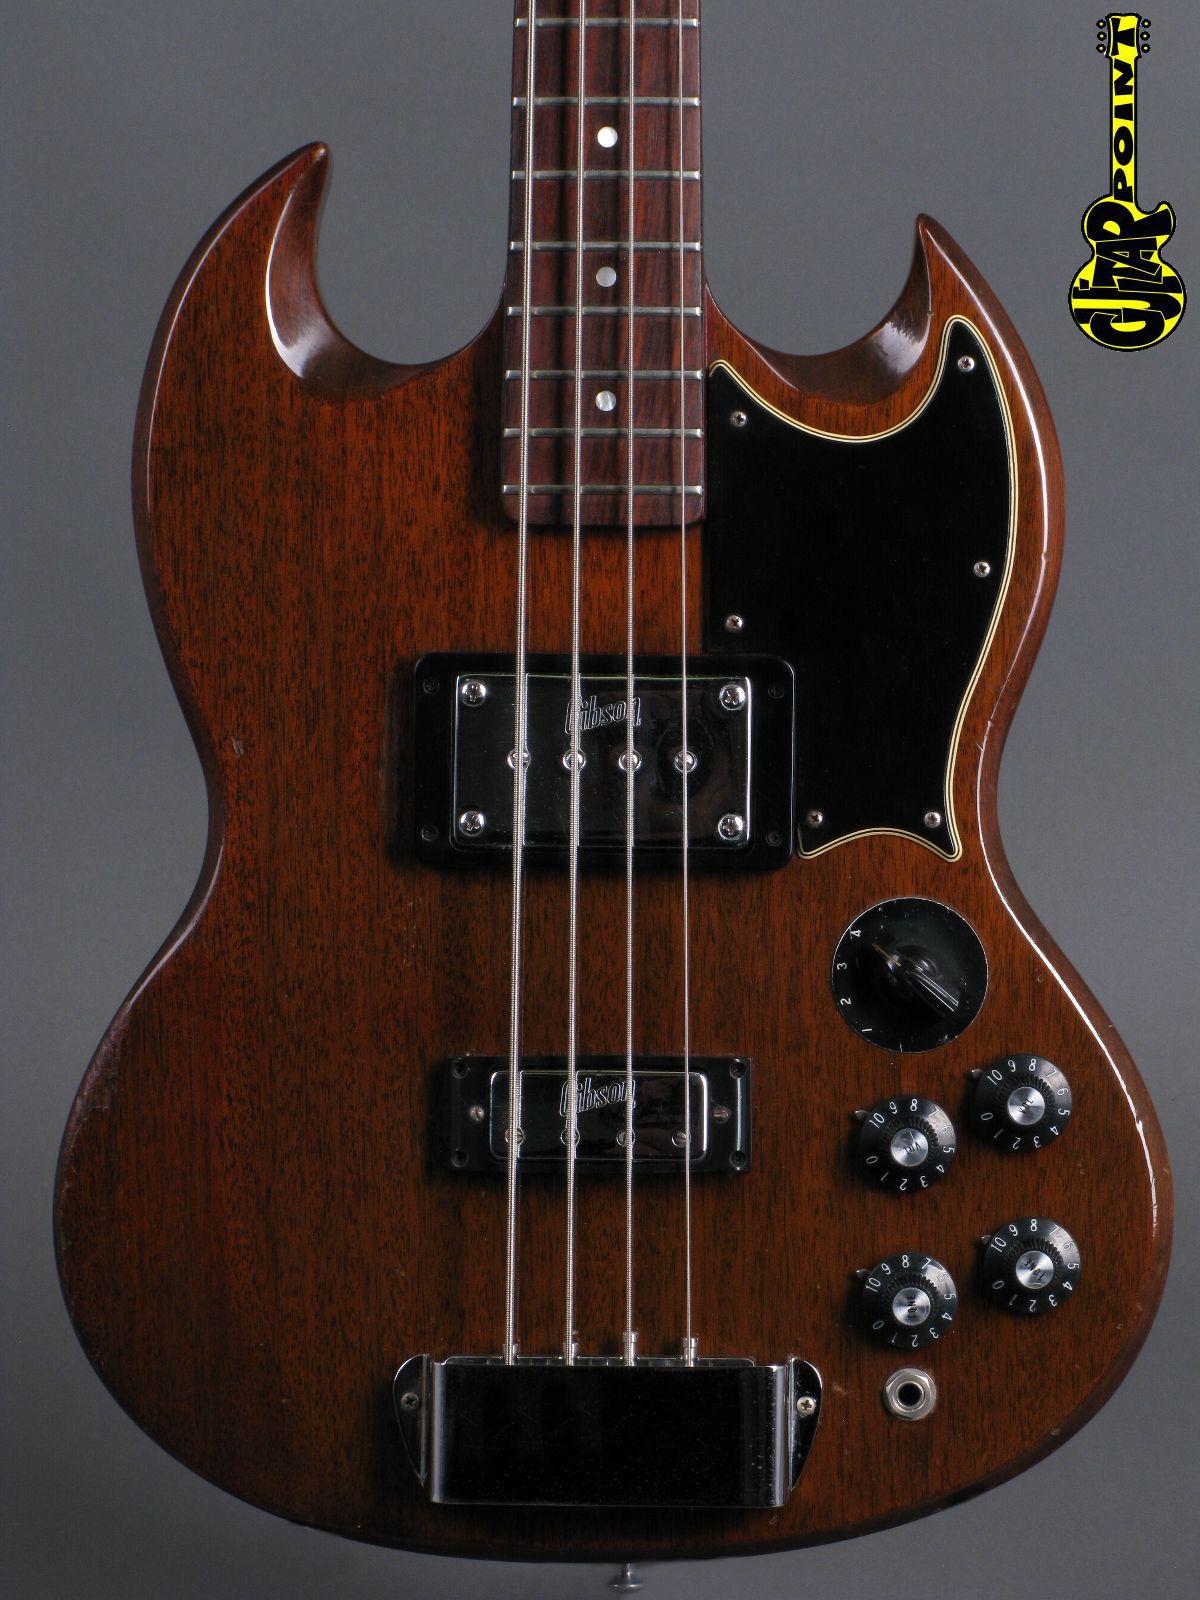 1972 Gibson EB-3 Bass - Cherry